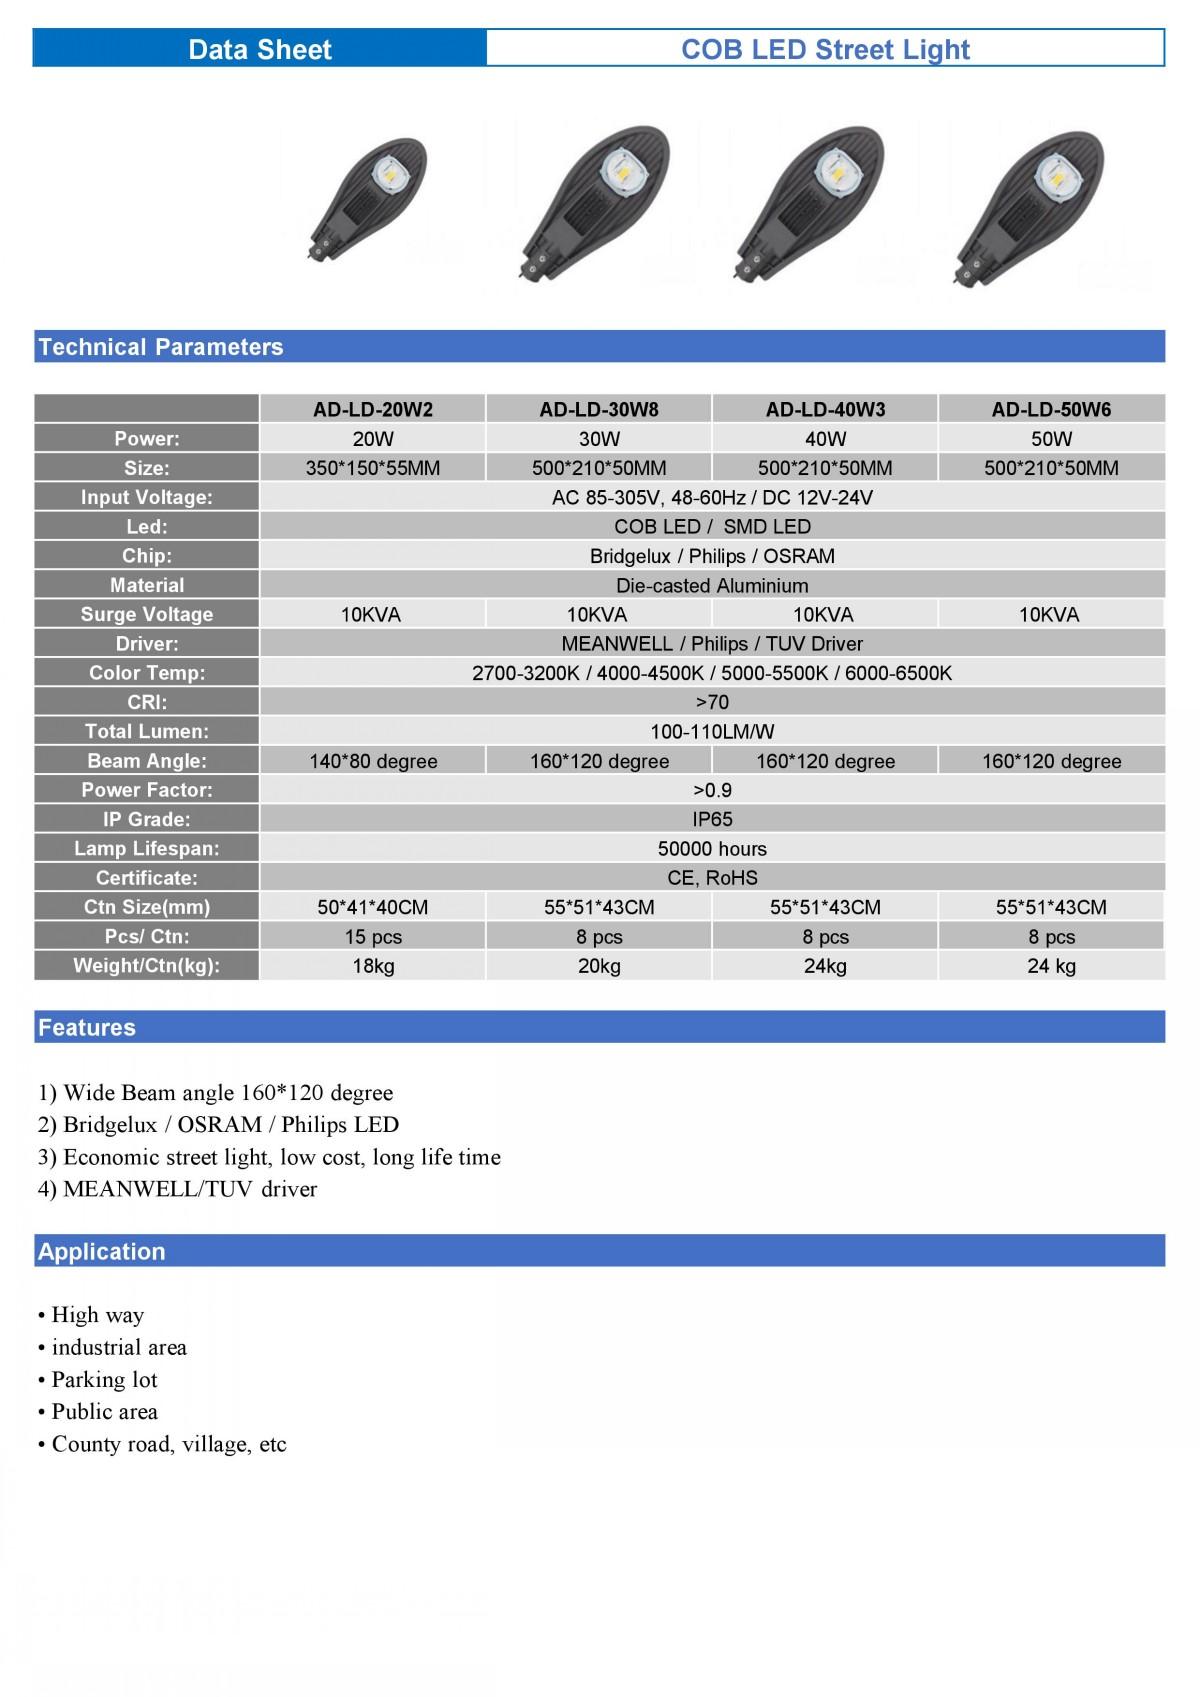 led street light COB 20-200W Data sheet (1)